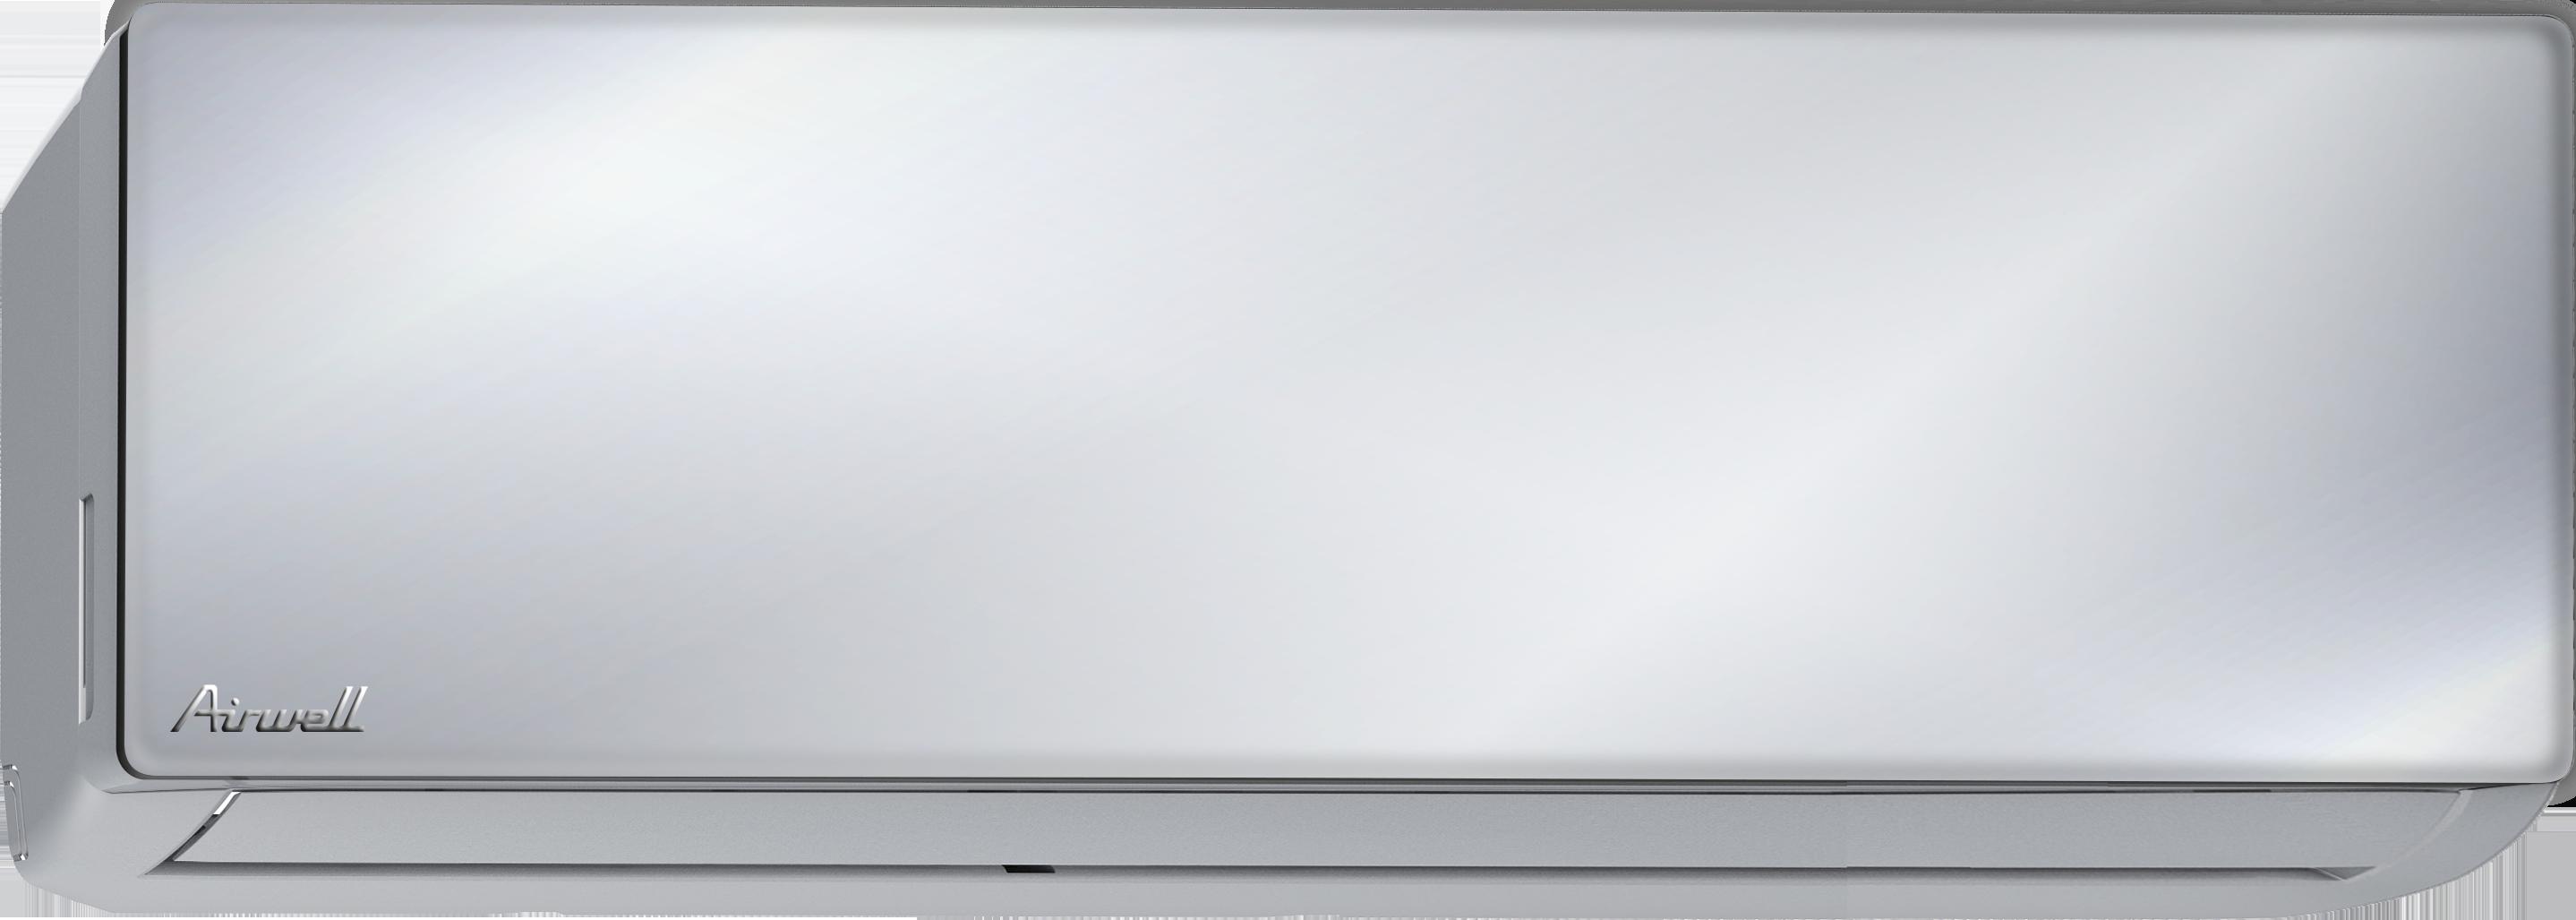 Climatiseur Airwell réversible inverter Harmonia AW-HDH018.